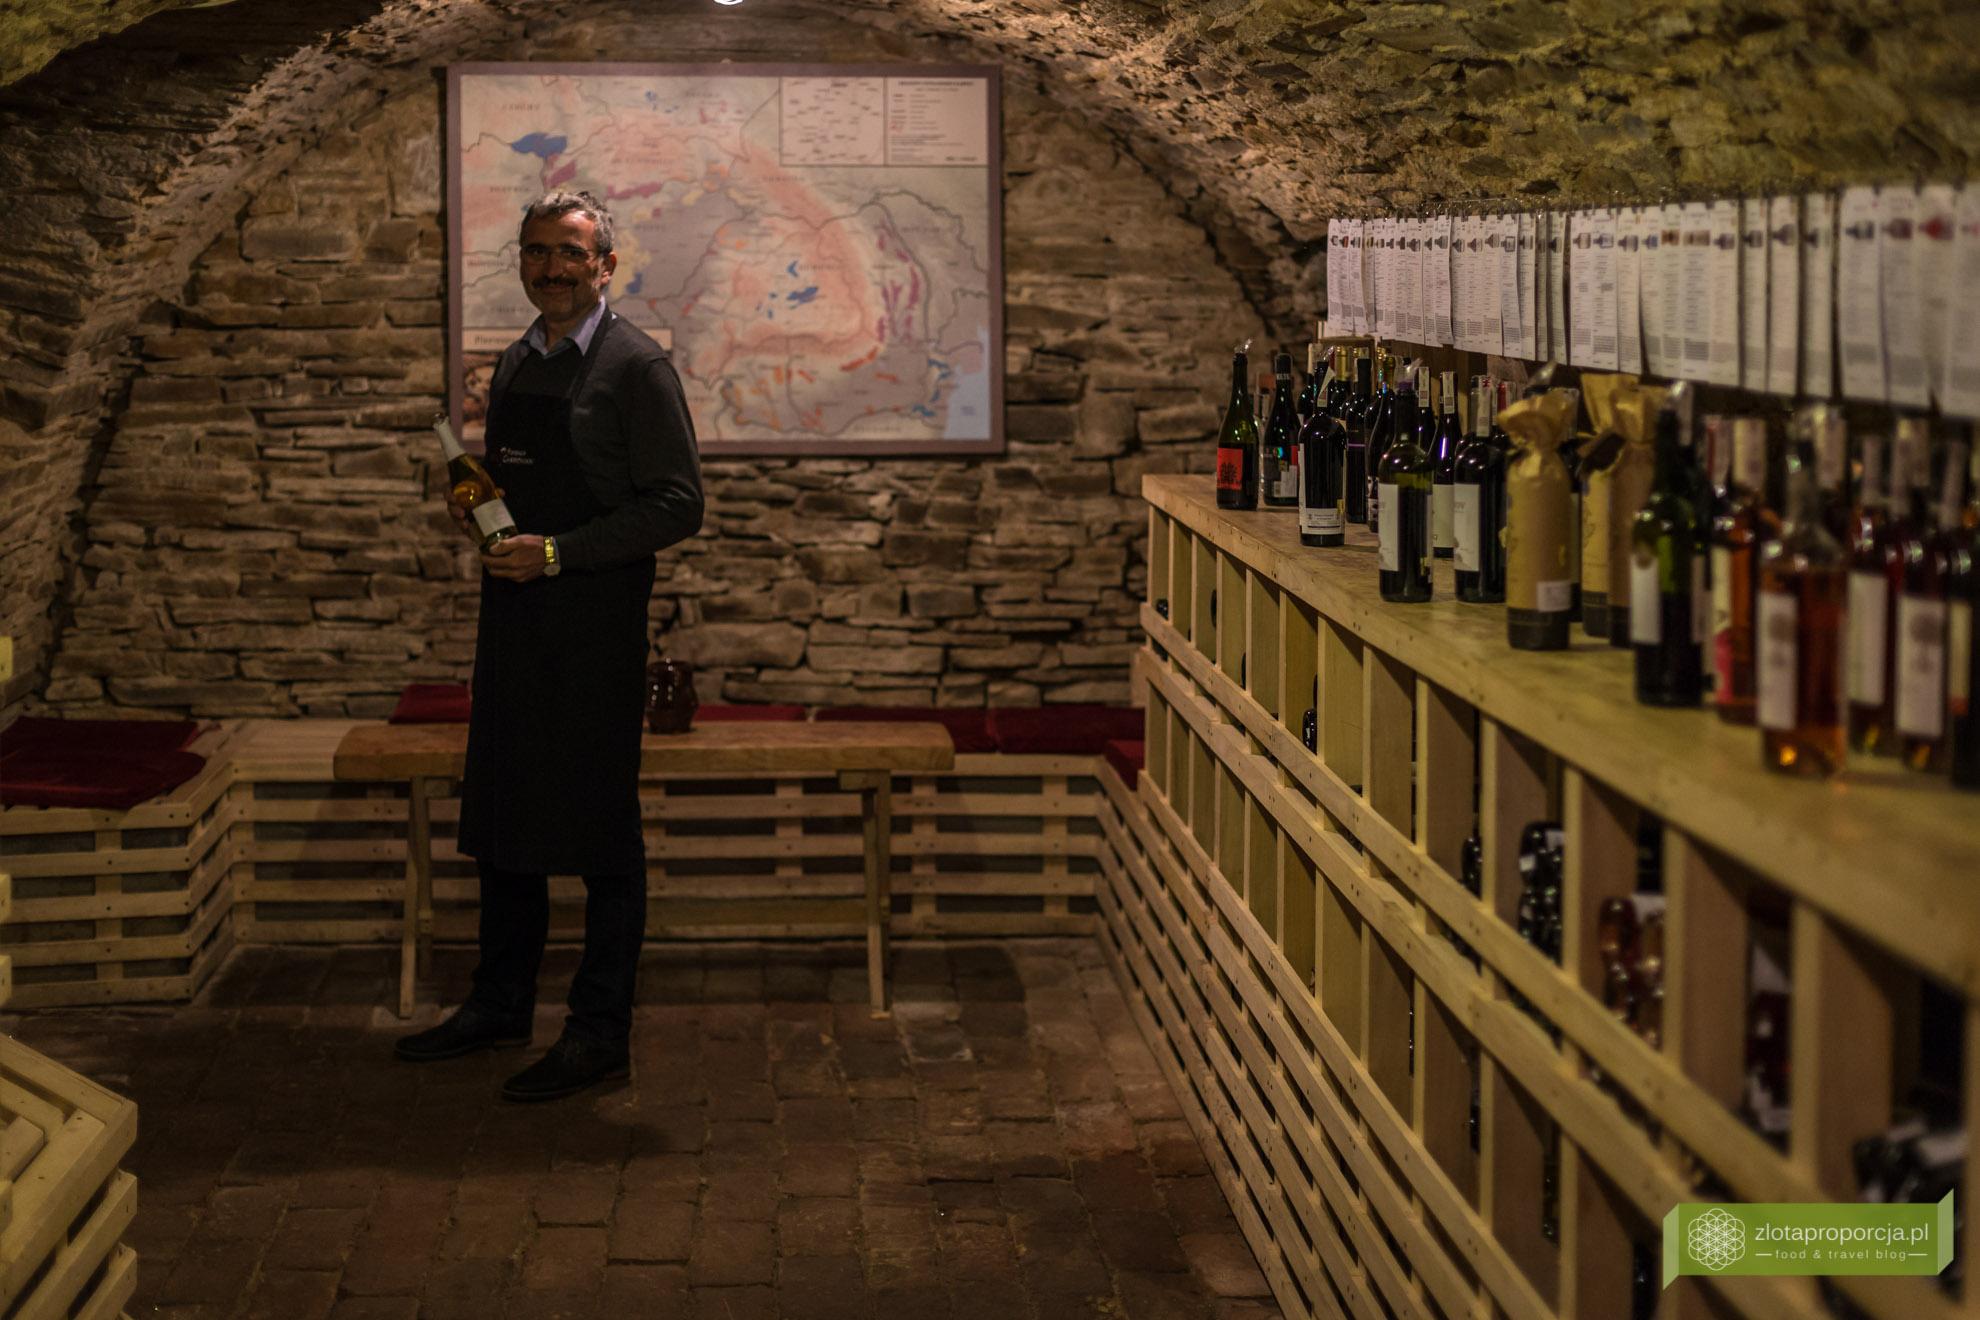 Salon Win Karpackich, Dwór Kombornia, Karpacki Szlak Wina, winnice na Podkarpaciu, winnice Podkarpacia,